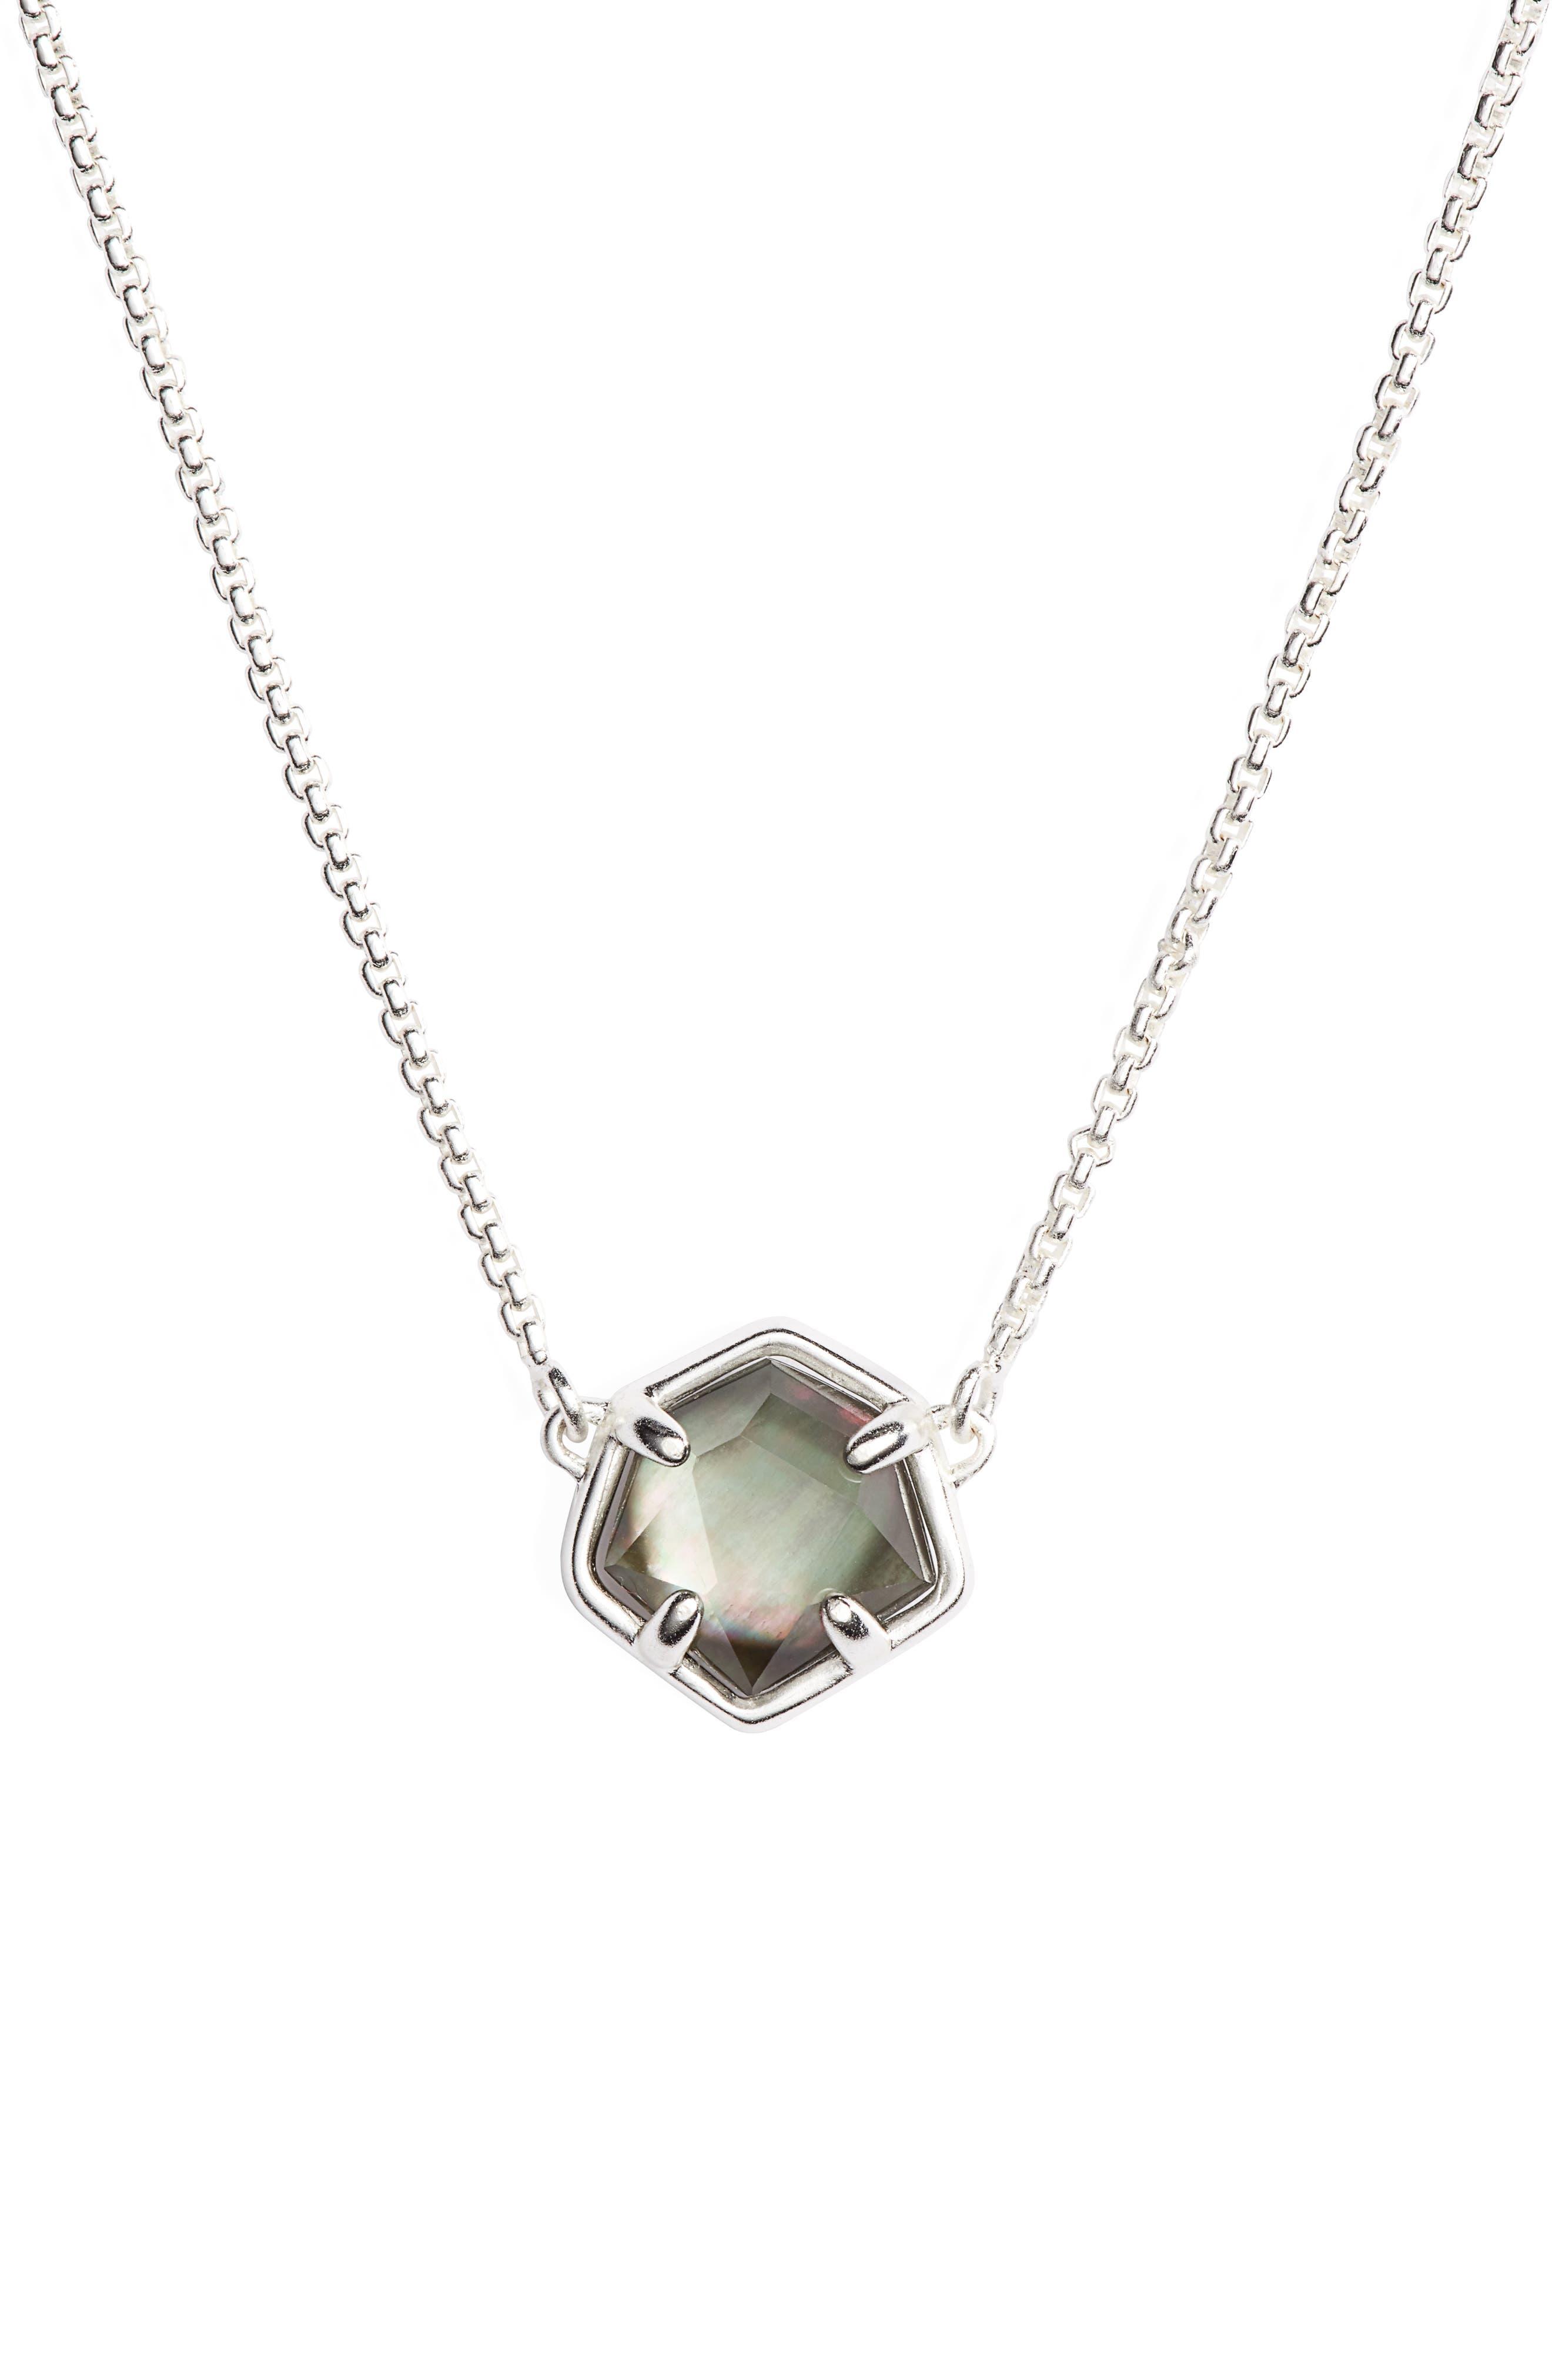 KENDRA SCOTT Jaxon Pendant Necklace, Main, color, 005